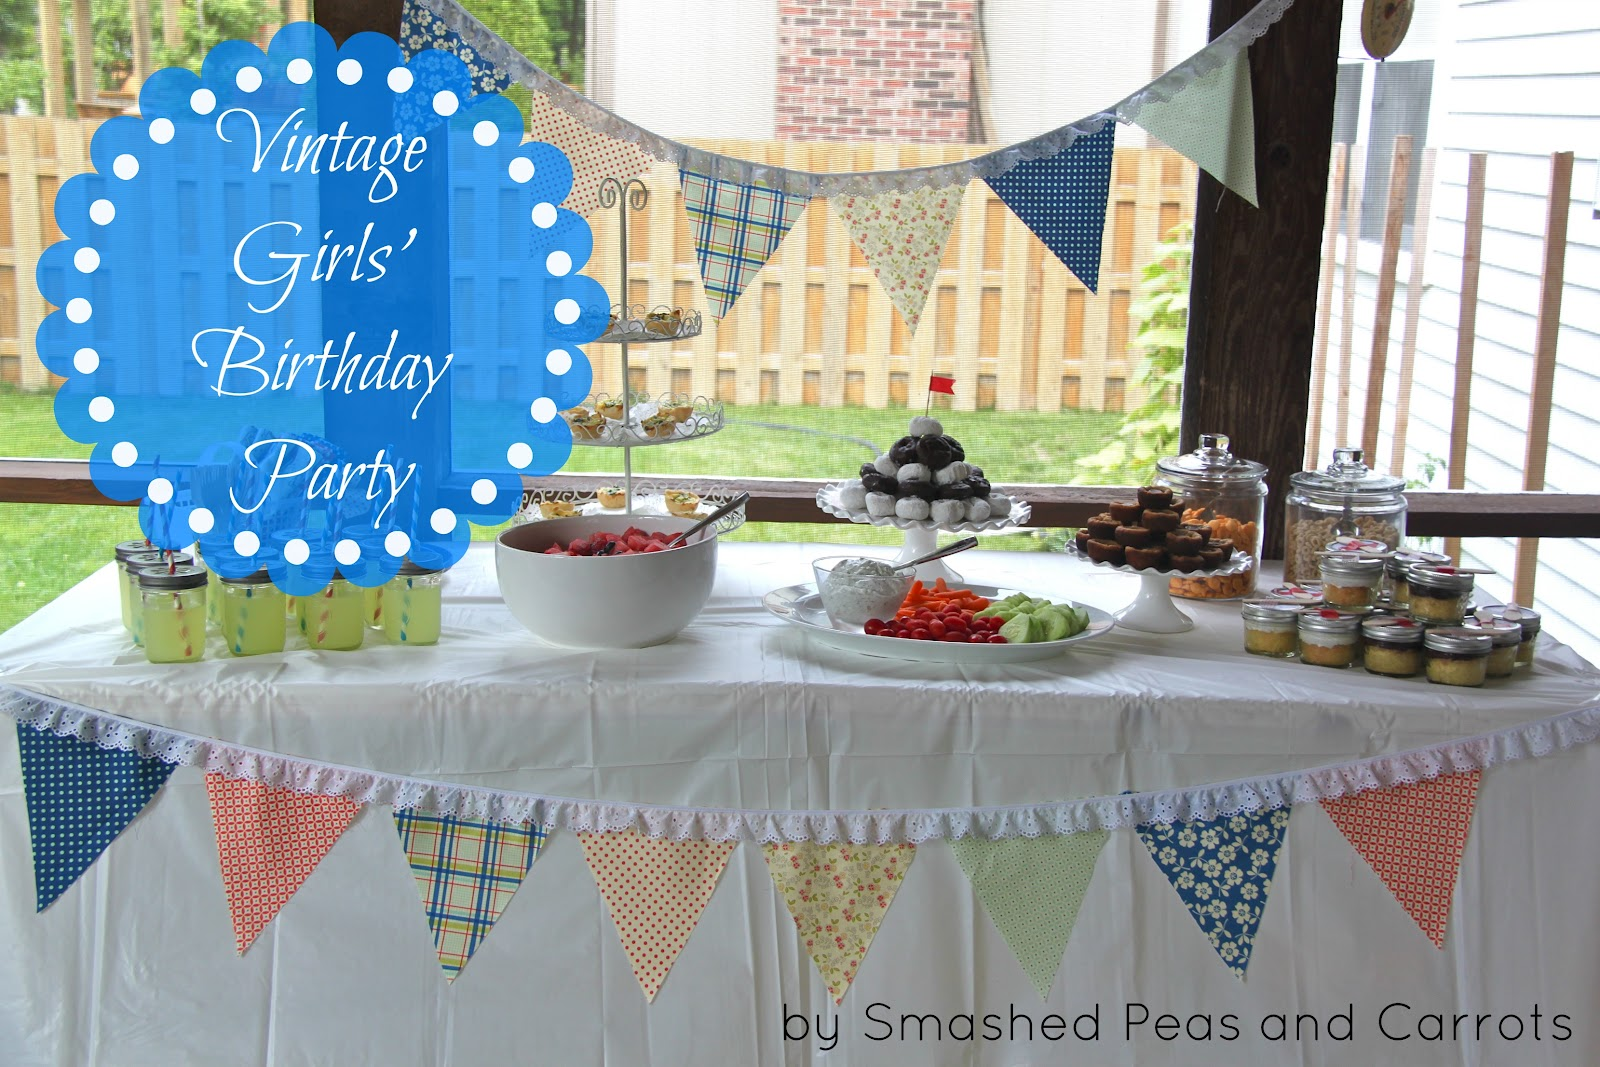 Vintage Girls Birthday Party